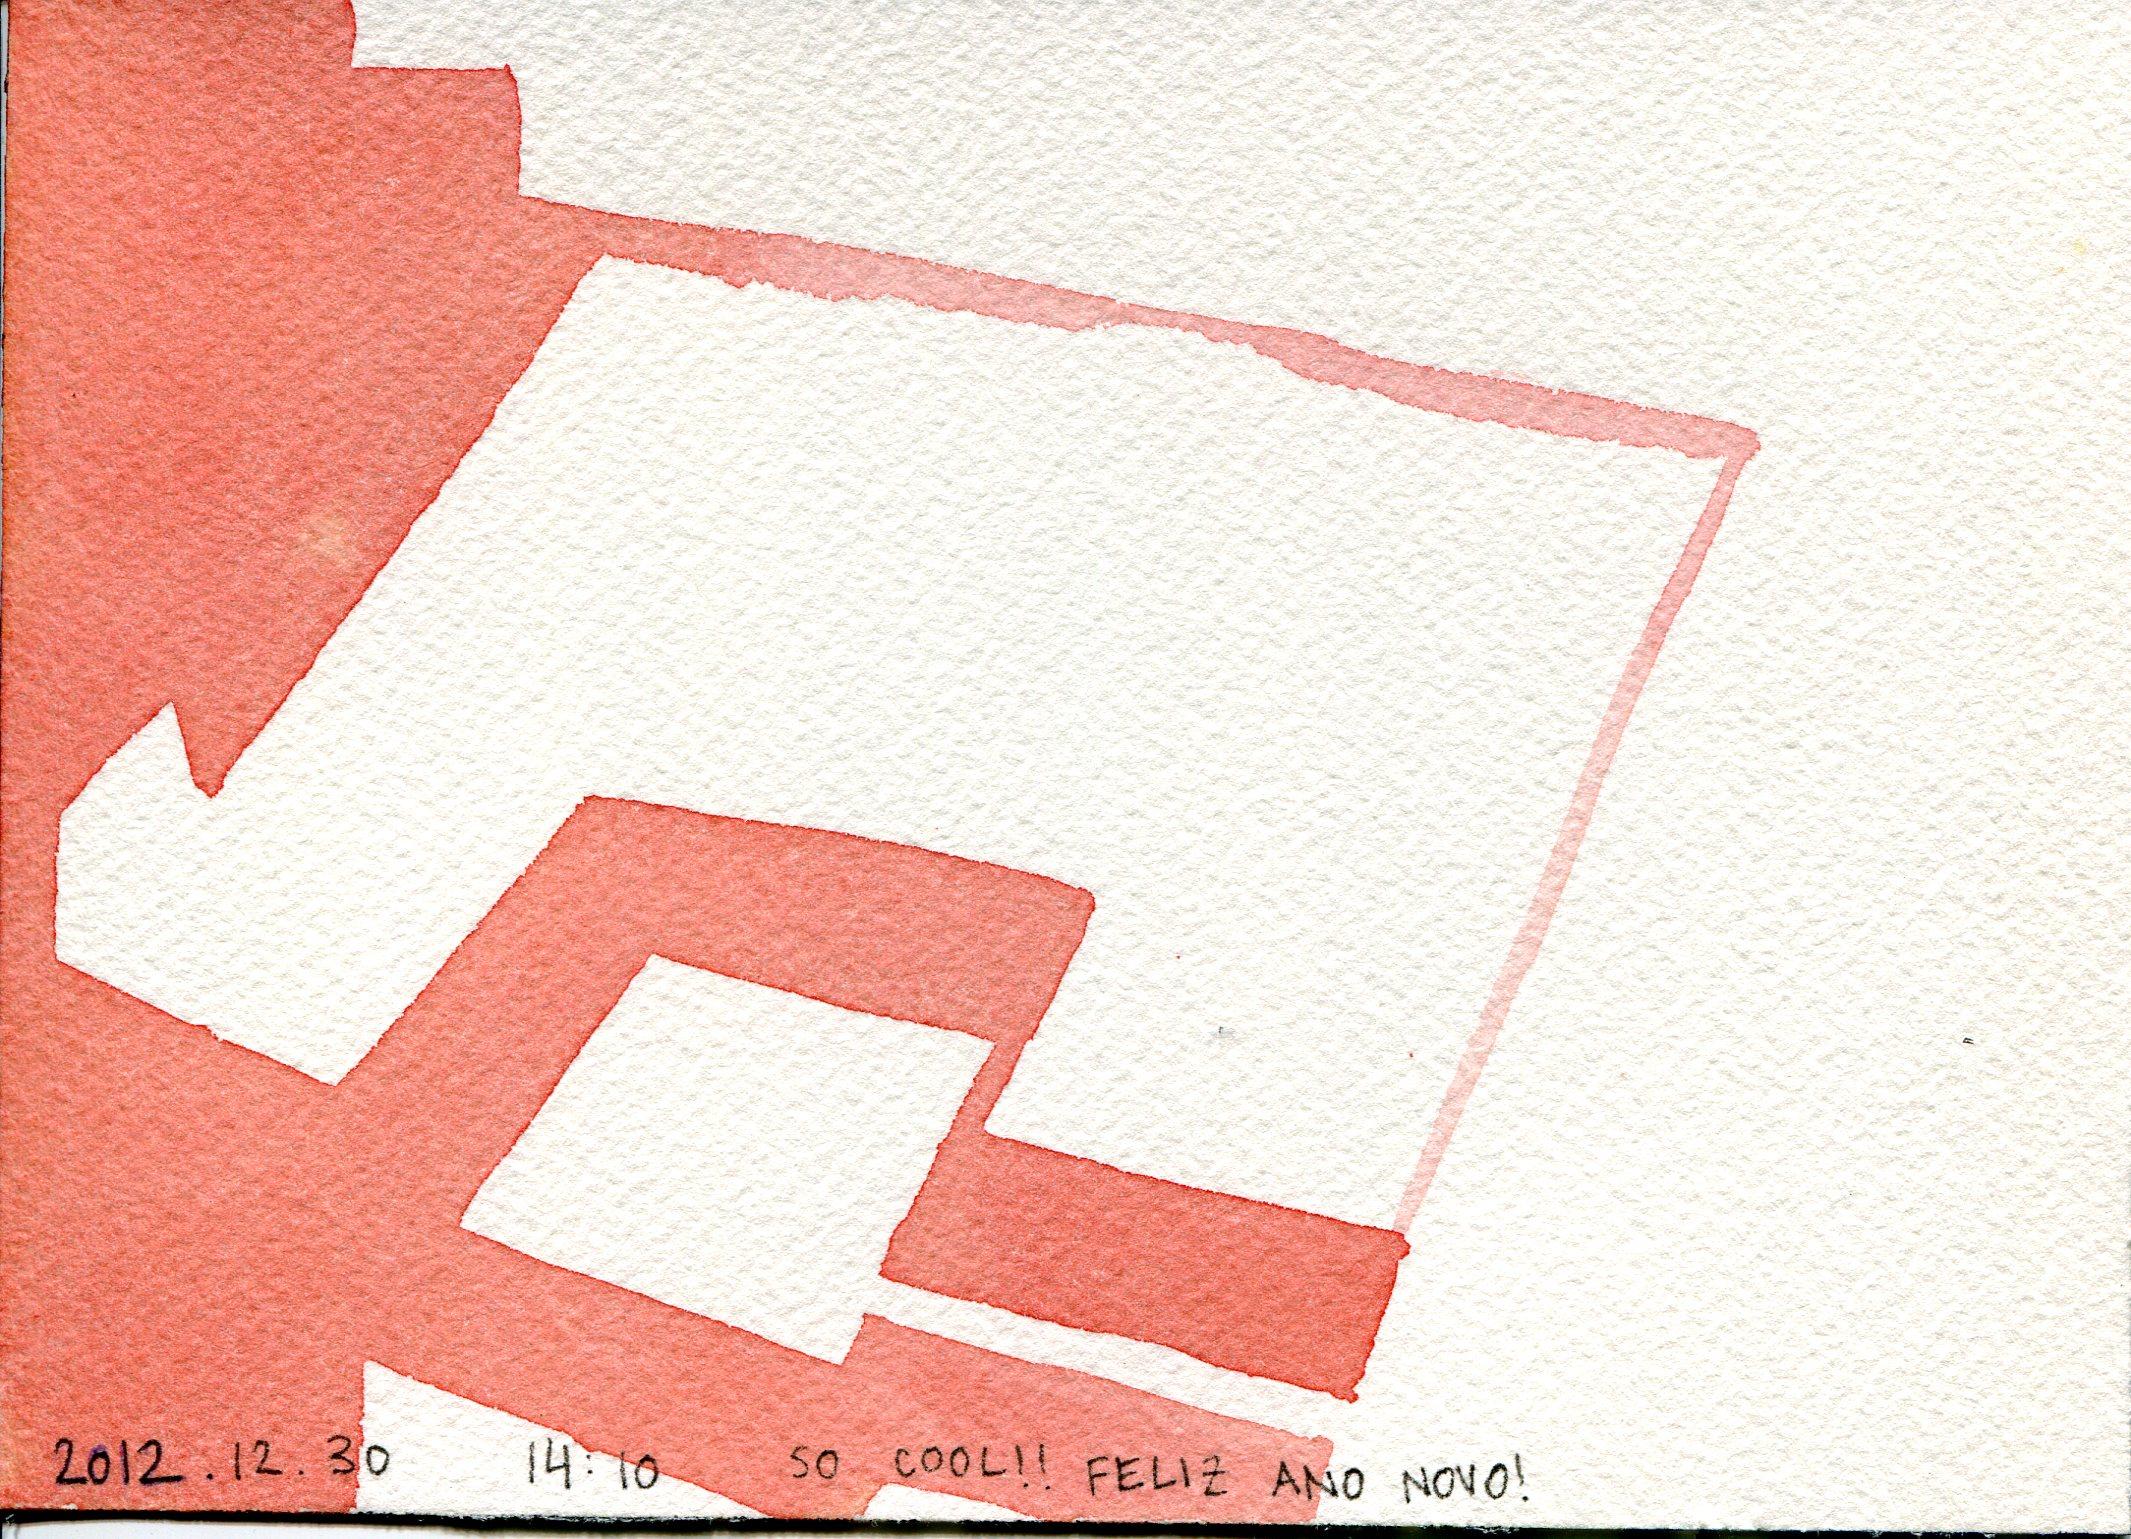 2013-01-12 drawing003.jpg